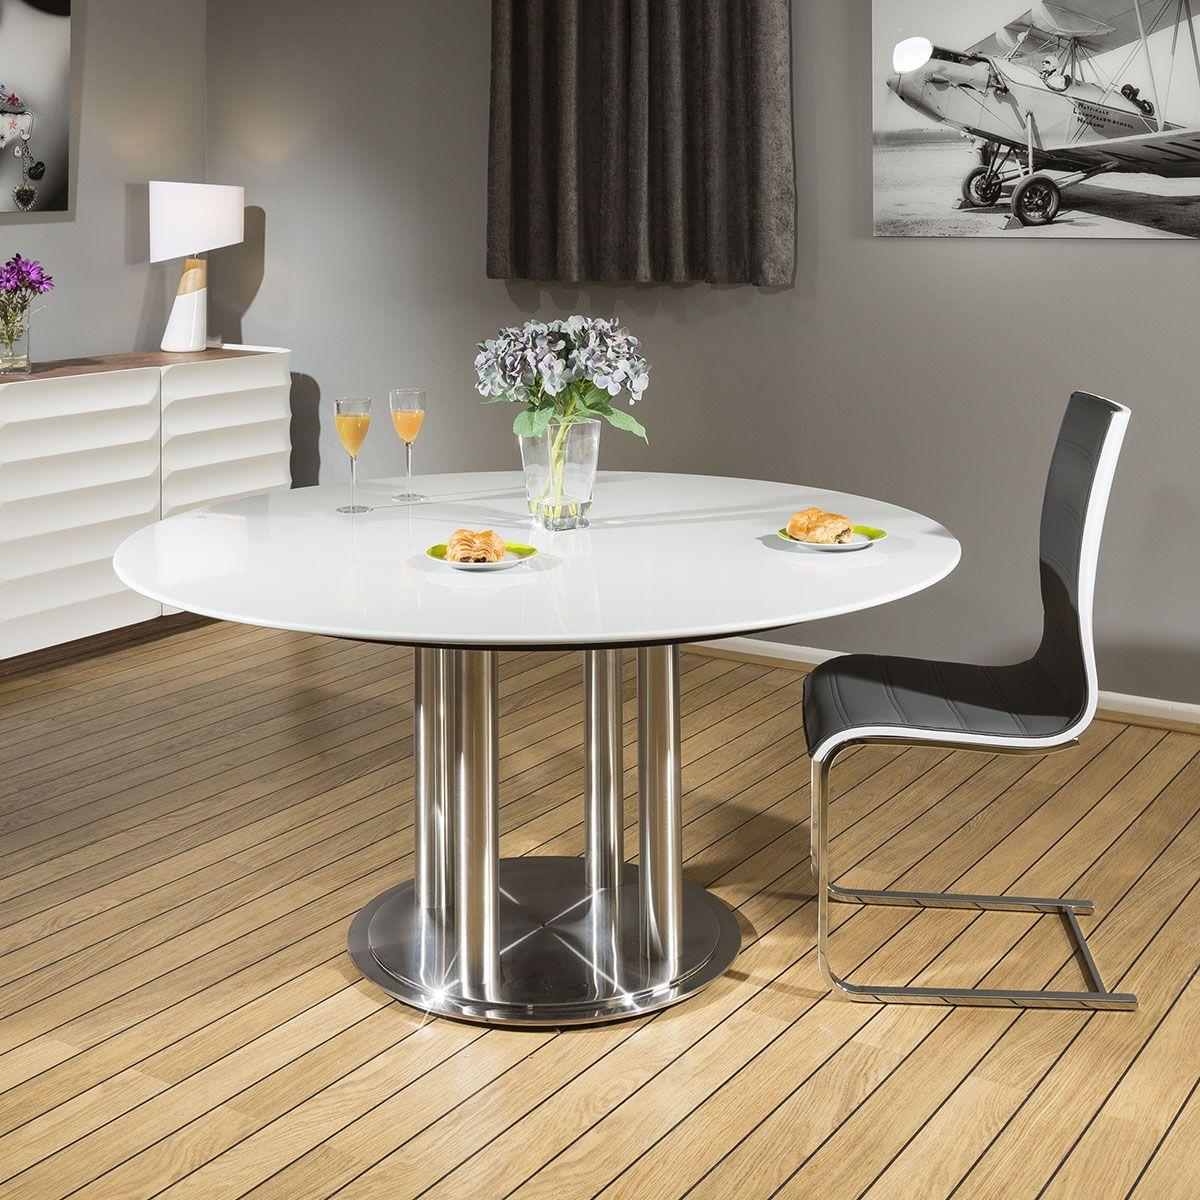 Quatropi Round Dining Table Grey 150cm